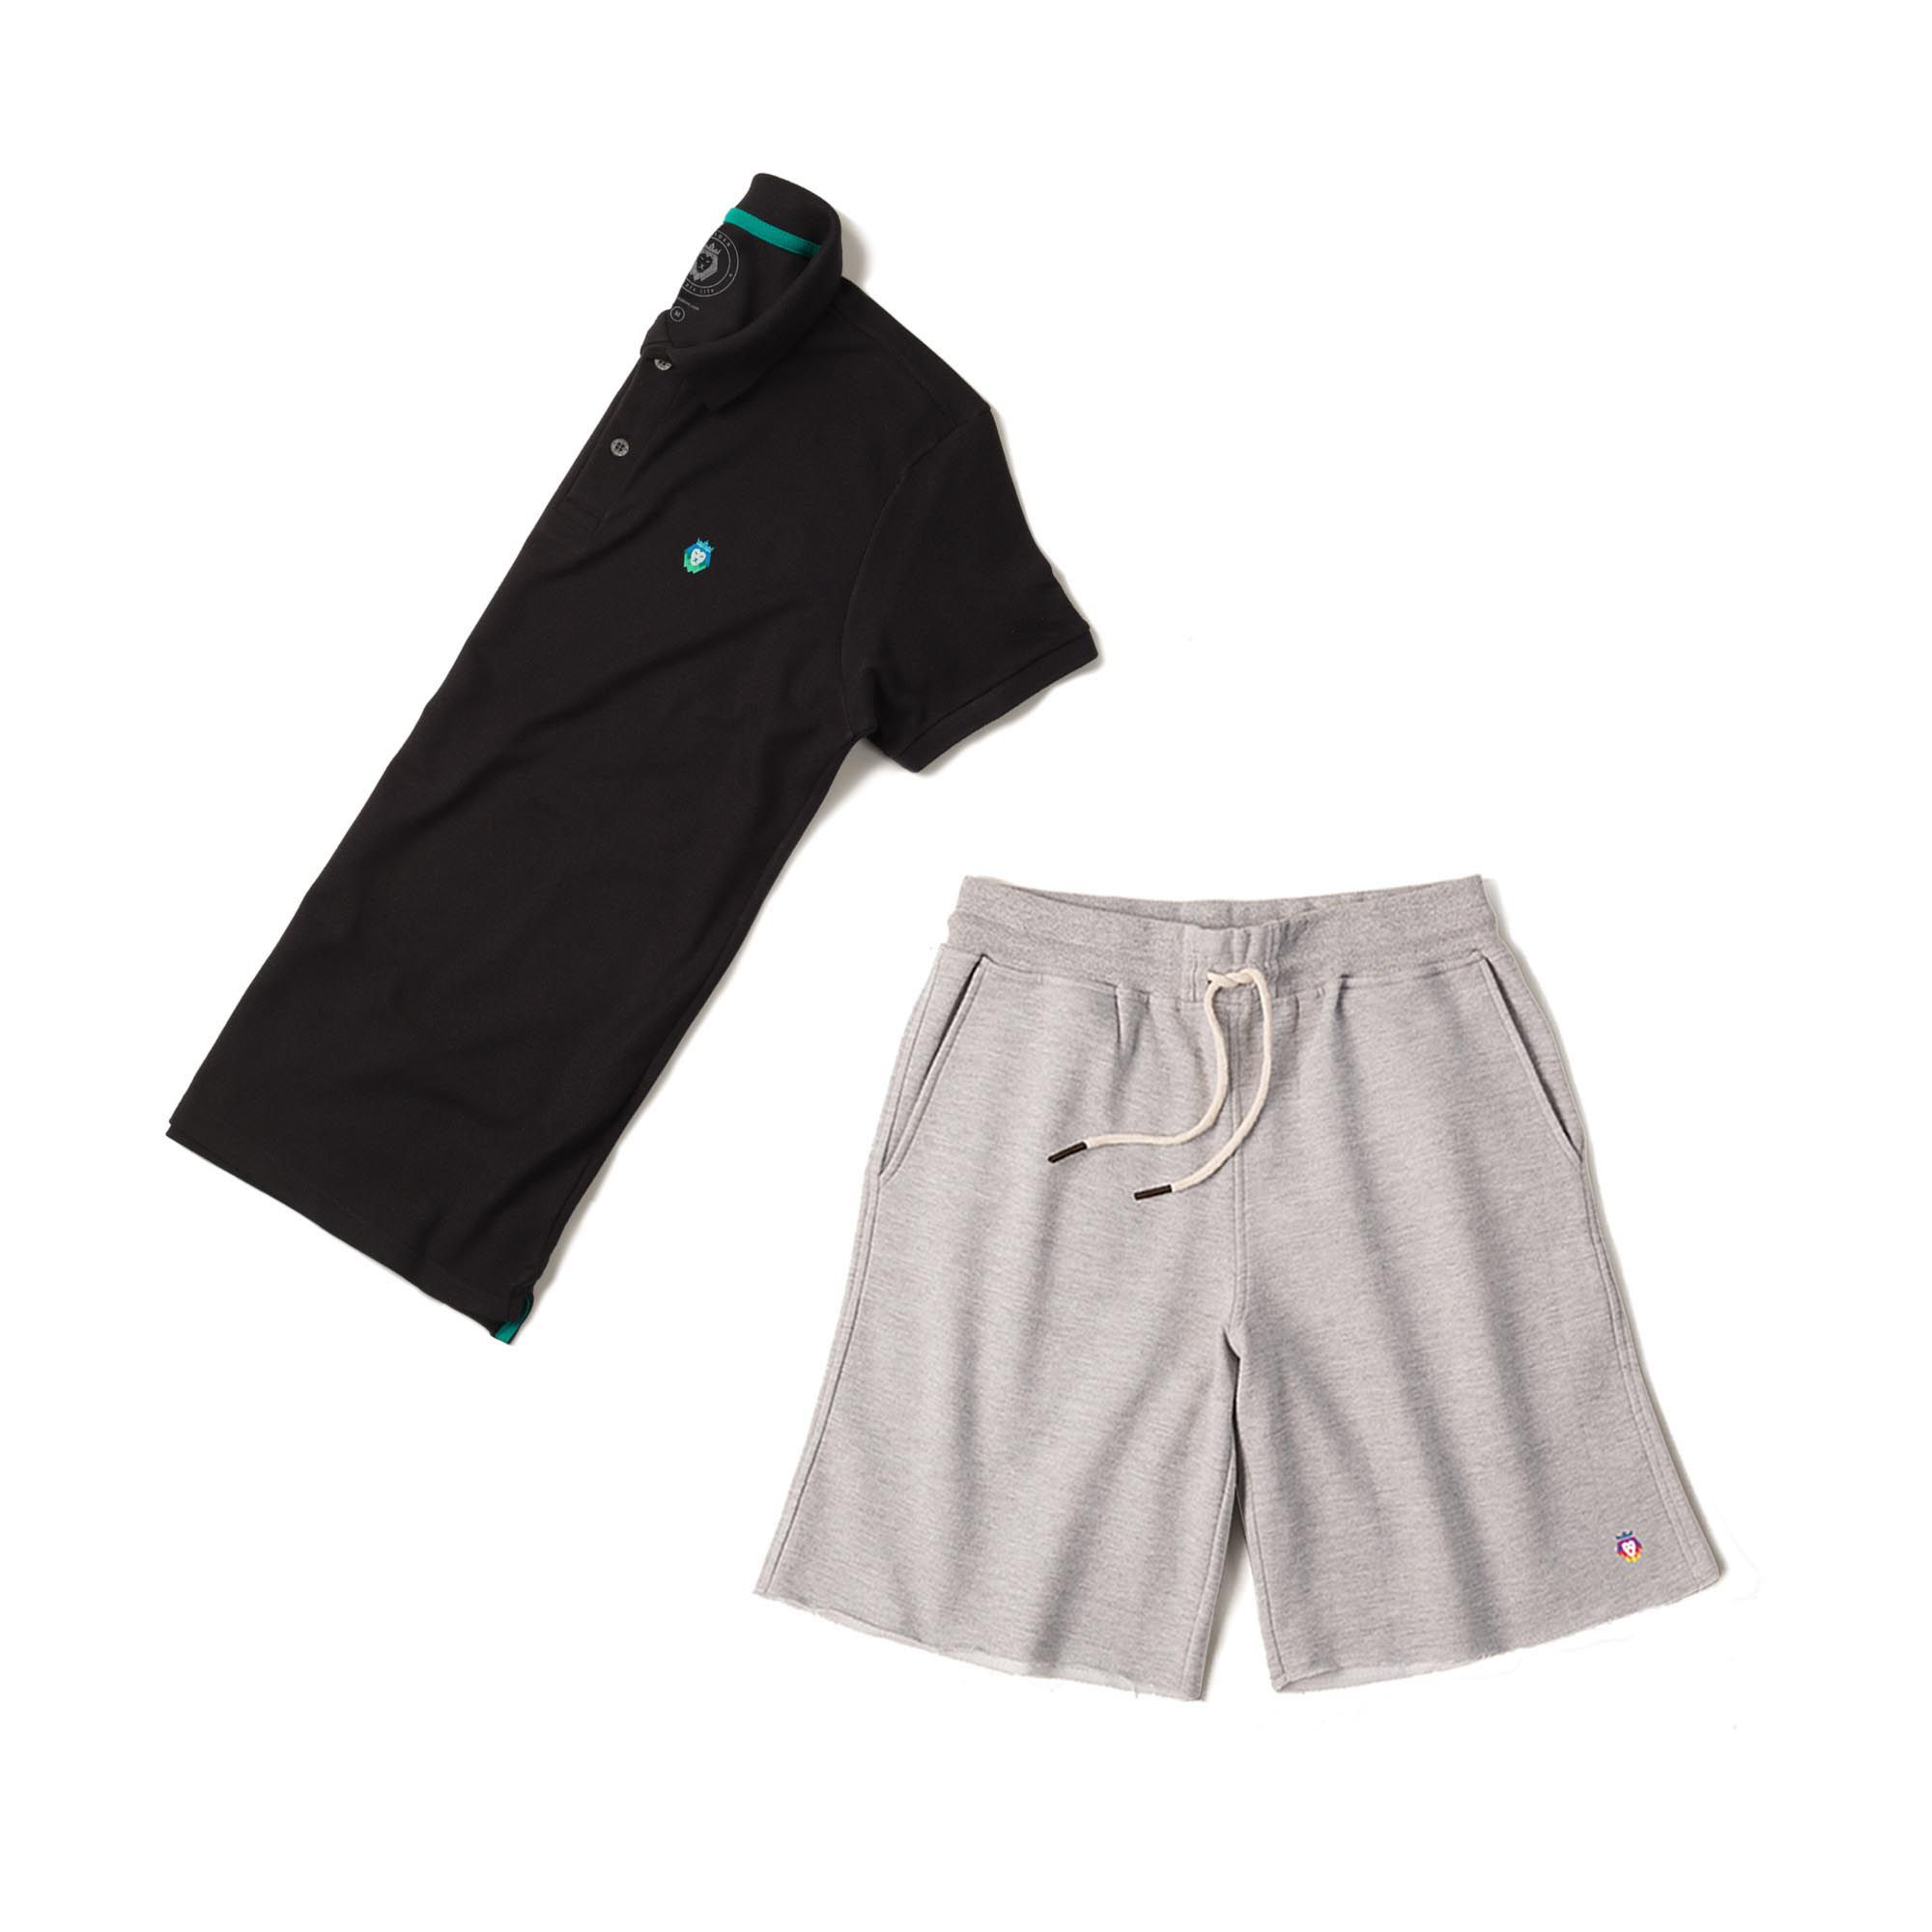 Kit 1 Bermuda Basic Mescla + 1 Camisa Polo Style Preta Zaiden Masculina